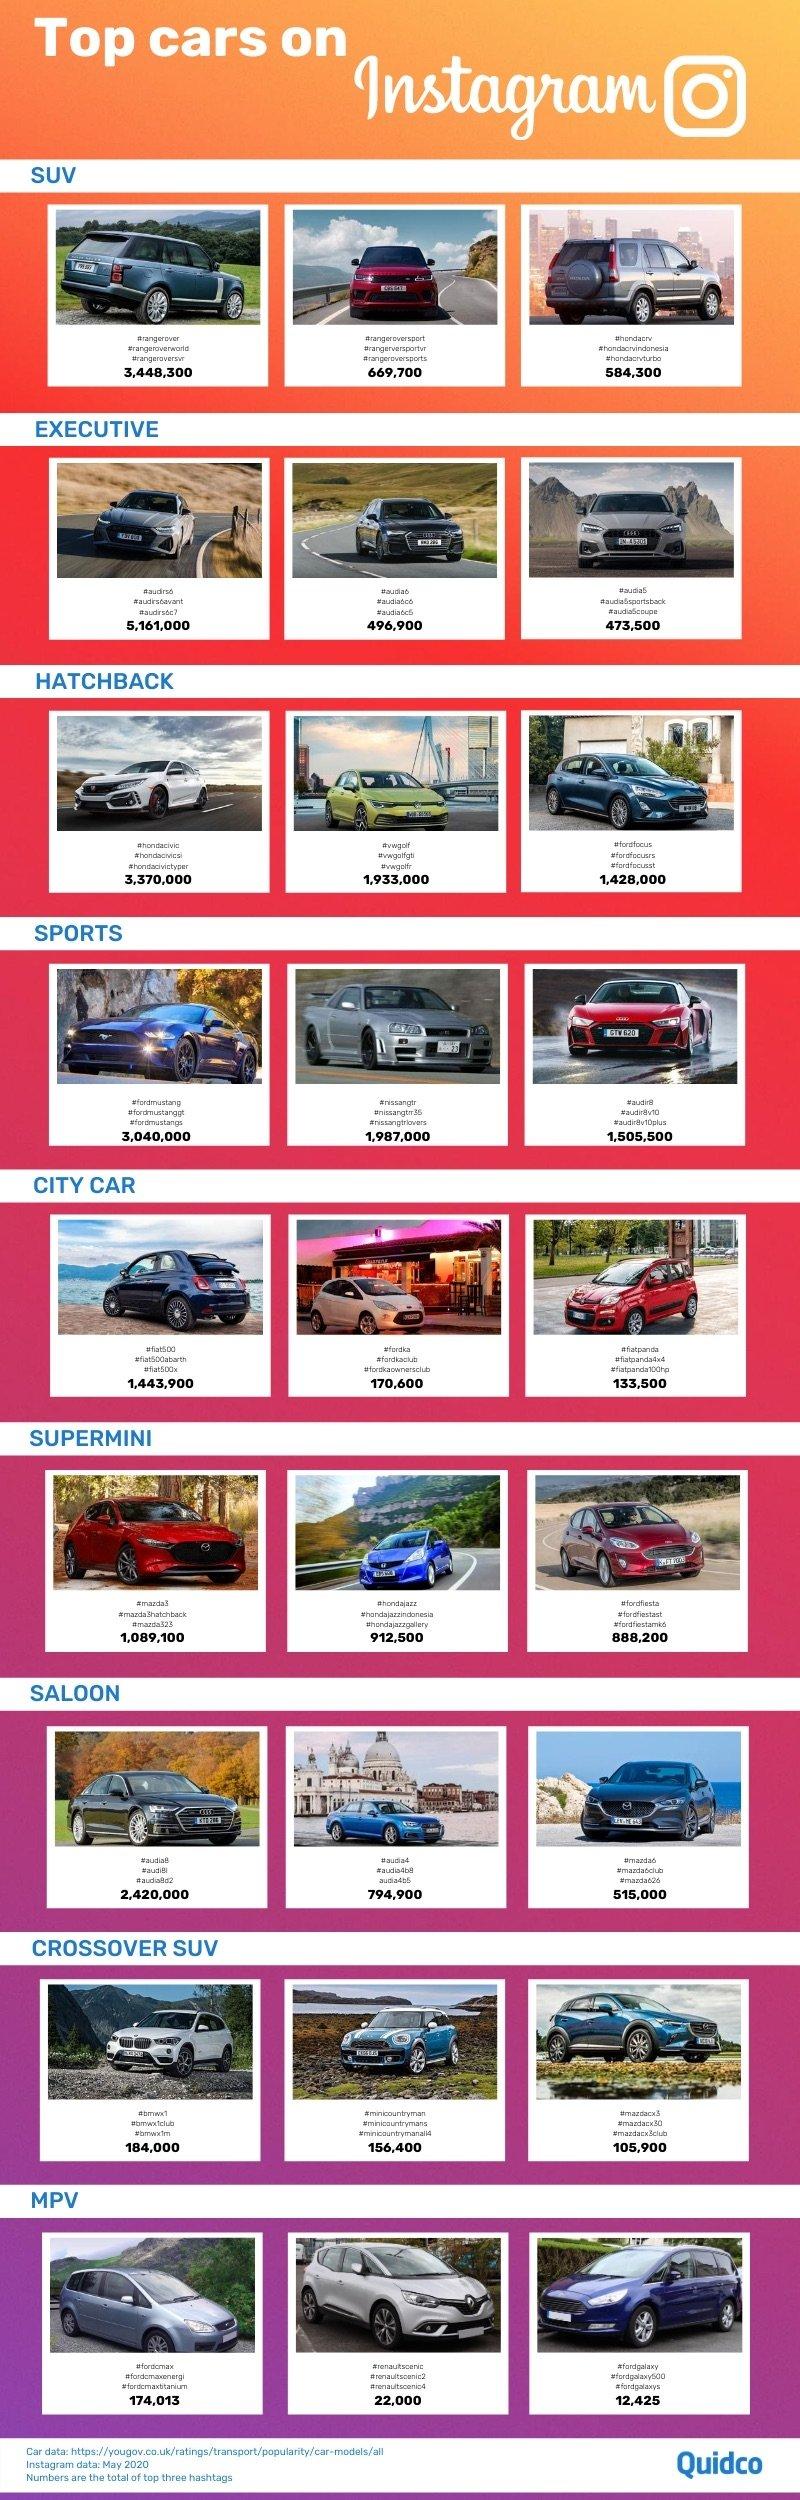 Top cars on Instagram